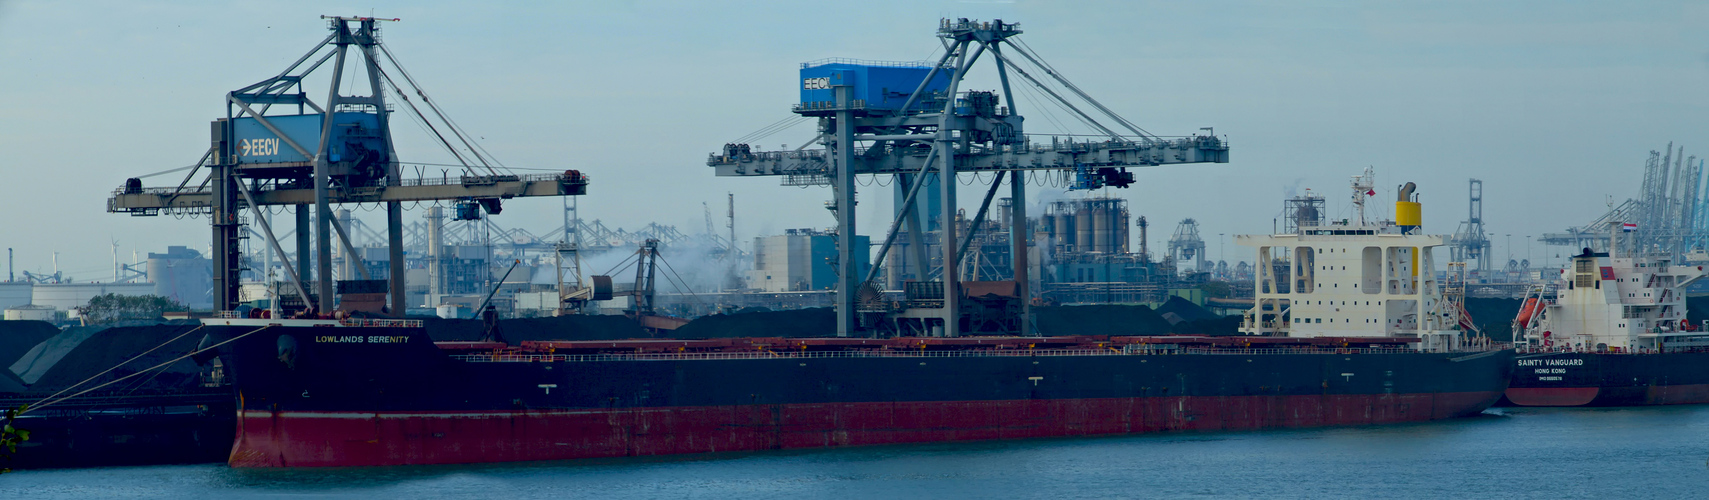 LOWLANDS SERENITY / Bulk Carrier / Europoort / Rotterdam / Bitte scrollen!